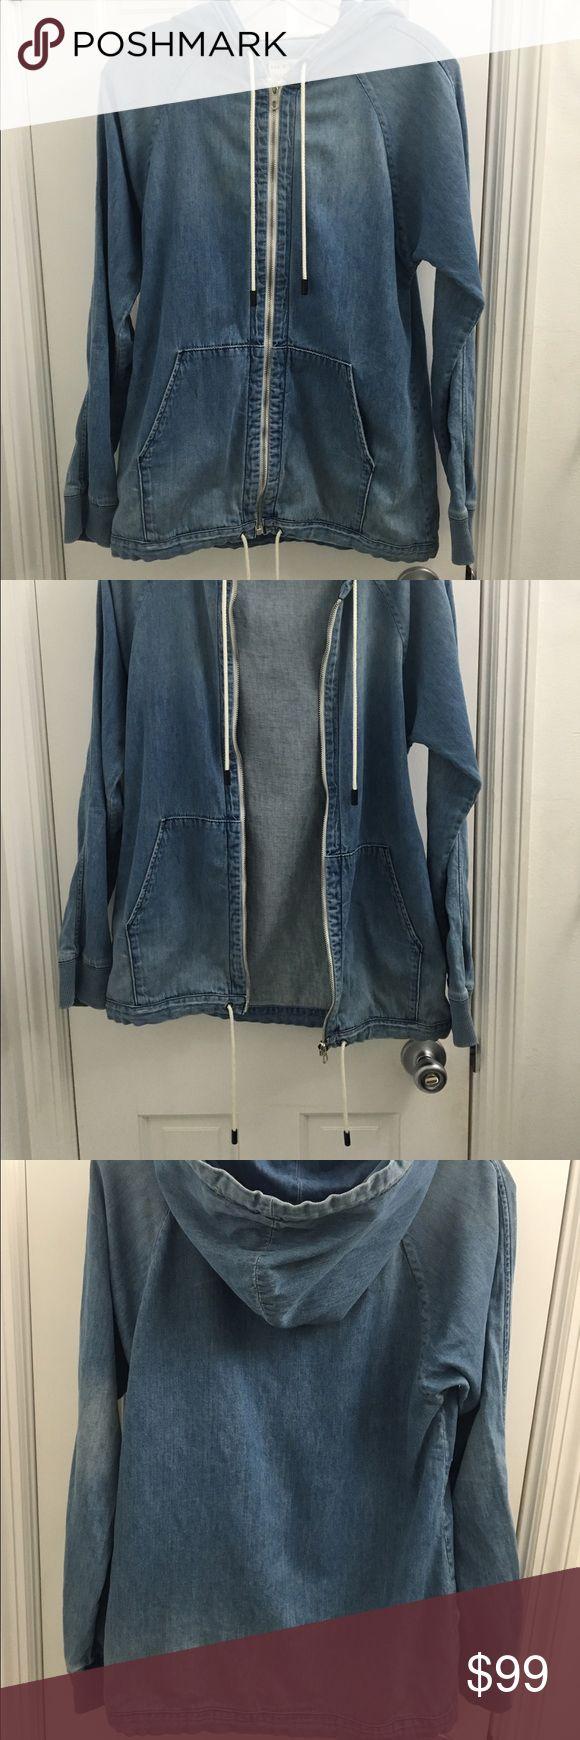 "Rag & Bone washed denim zip up jacket Rag & Bone ""dirty denim"" zip up draw string hooded jacket. Only worn once! Like new with no tags! Super cute size XS rag & bone Jackets & Coats Jean Jackets"